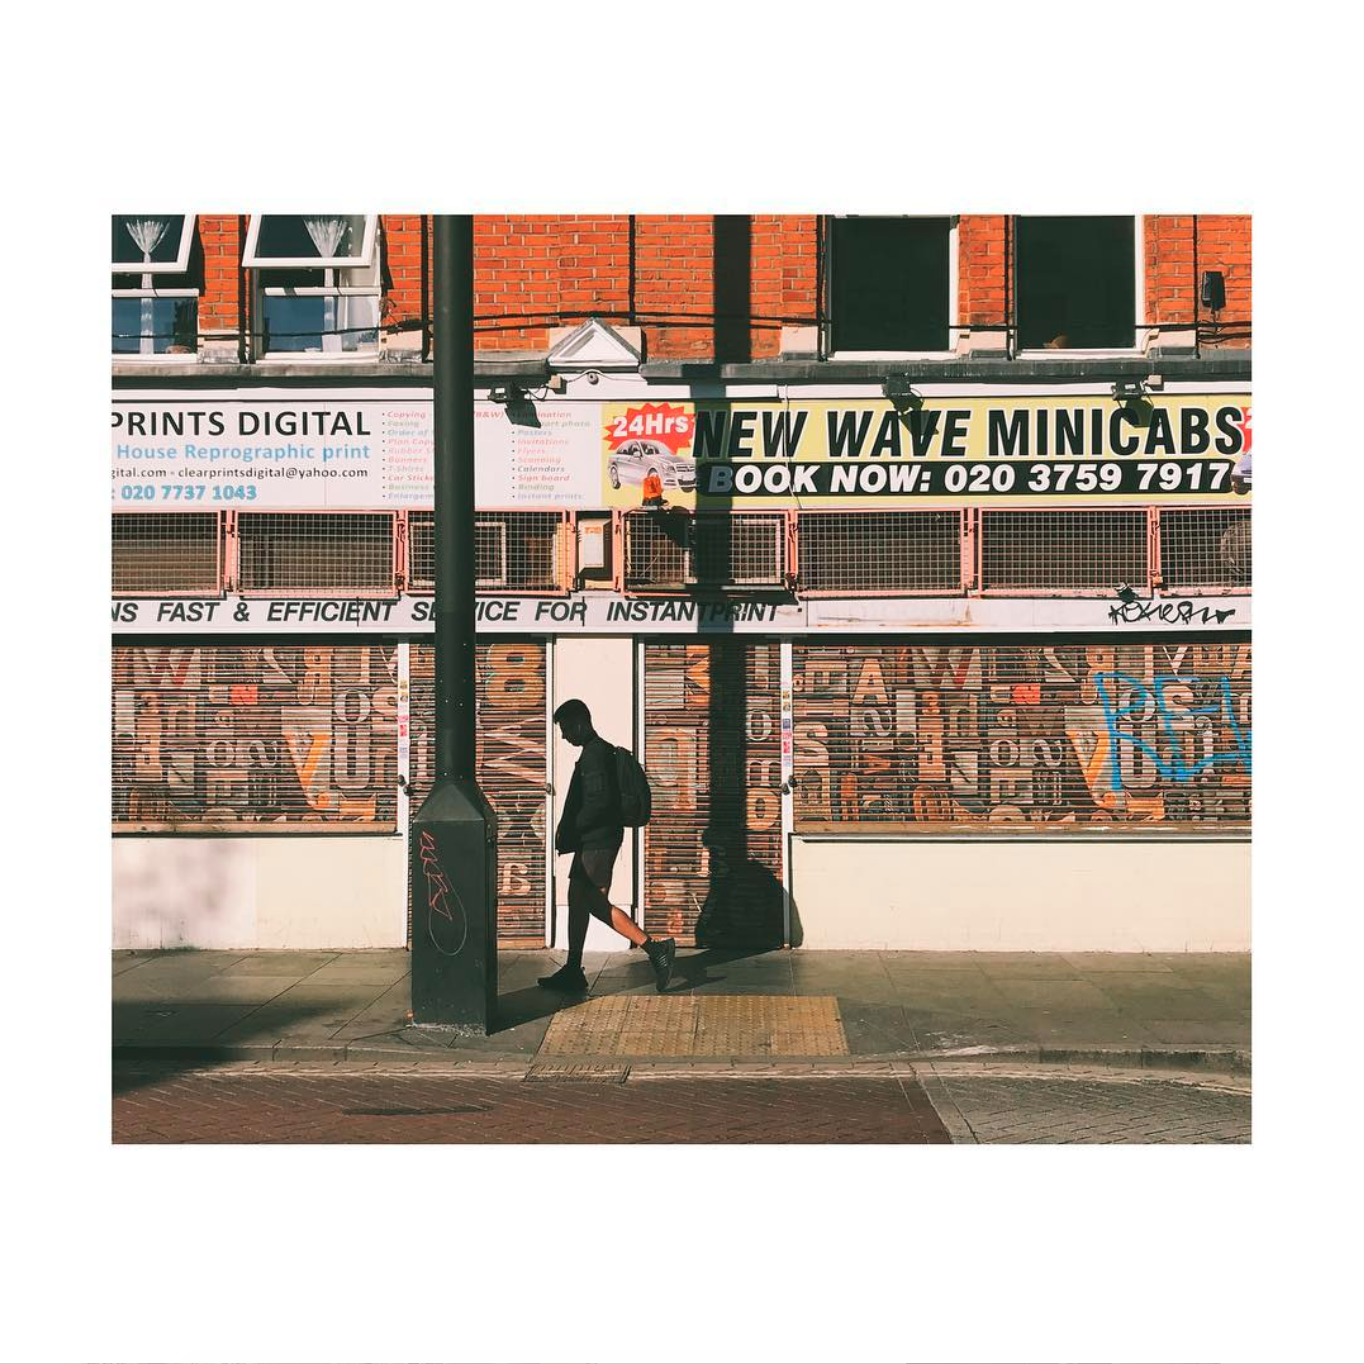 Brixton, London – UK